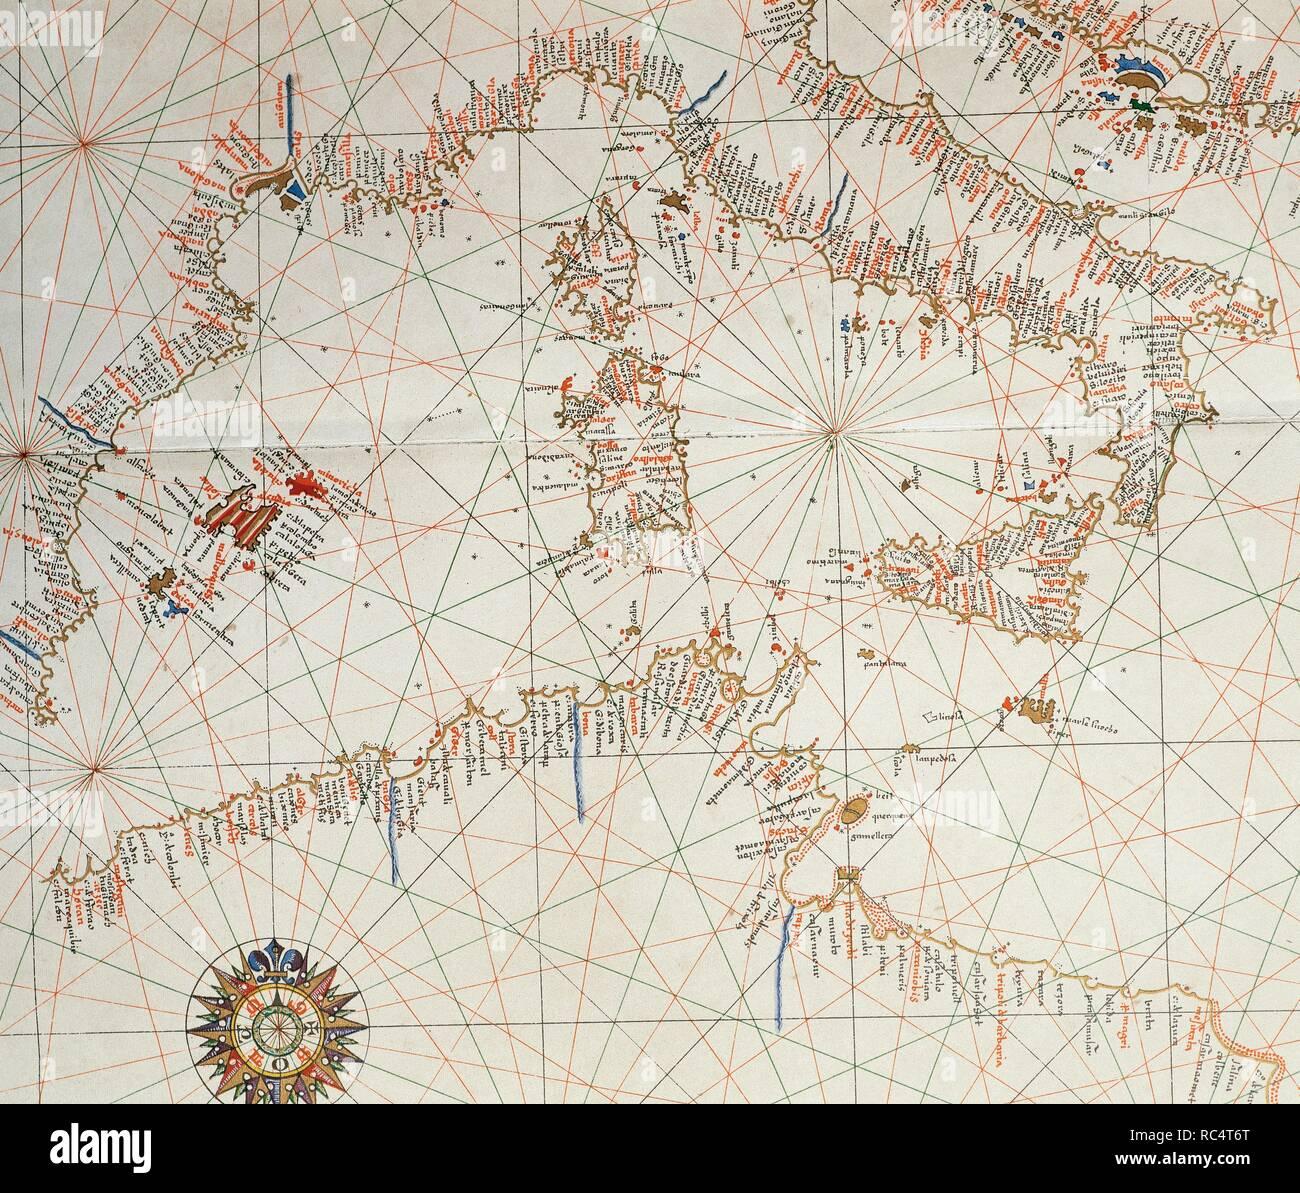 Nautical chart. Atlas of Joan Martines, 1587. Dedicated to Philip II. Mallorcan School. Detail: Western Medierranean. Stock Photo